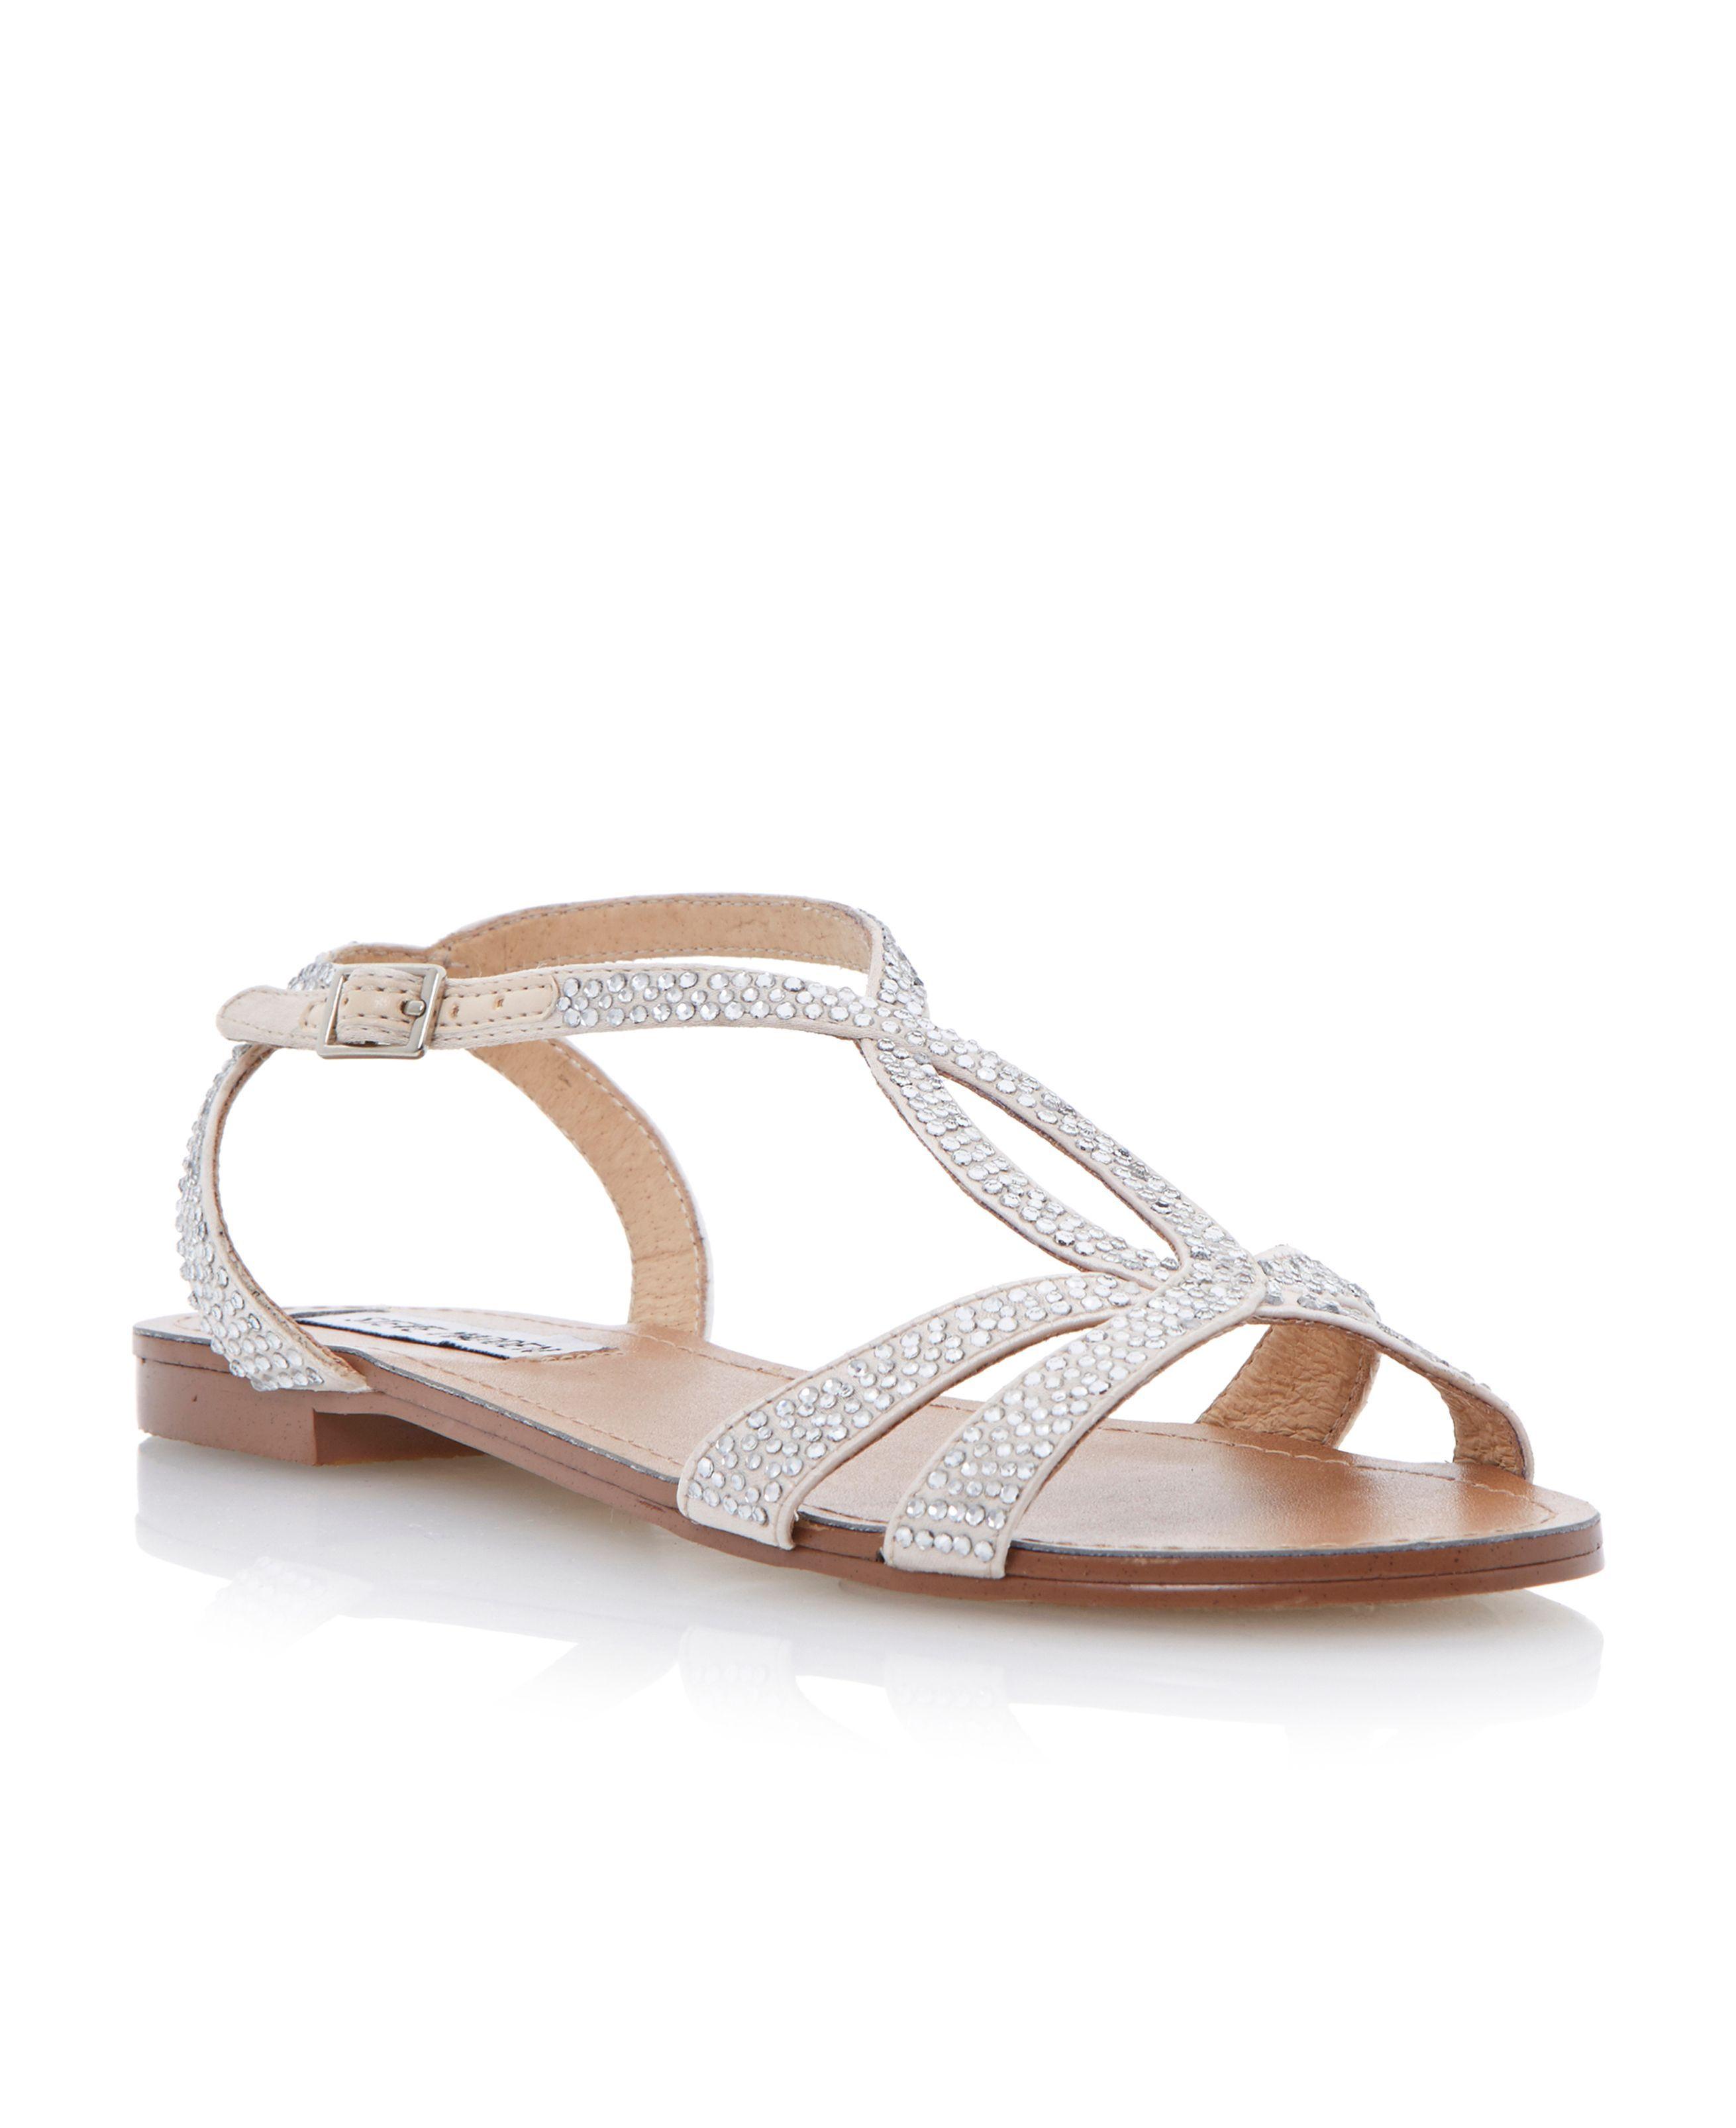 4d5279457 Flip Flop Sandals, Strap Sandals, Flat Sandals, Flip Flops, Bridal  Accessories, Dune, Shoes Online, Steve Madden, Espadrilles